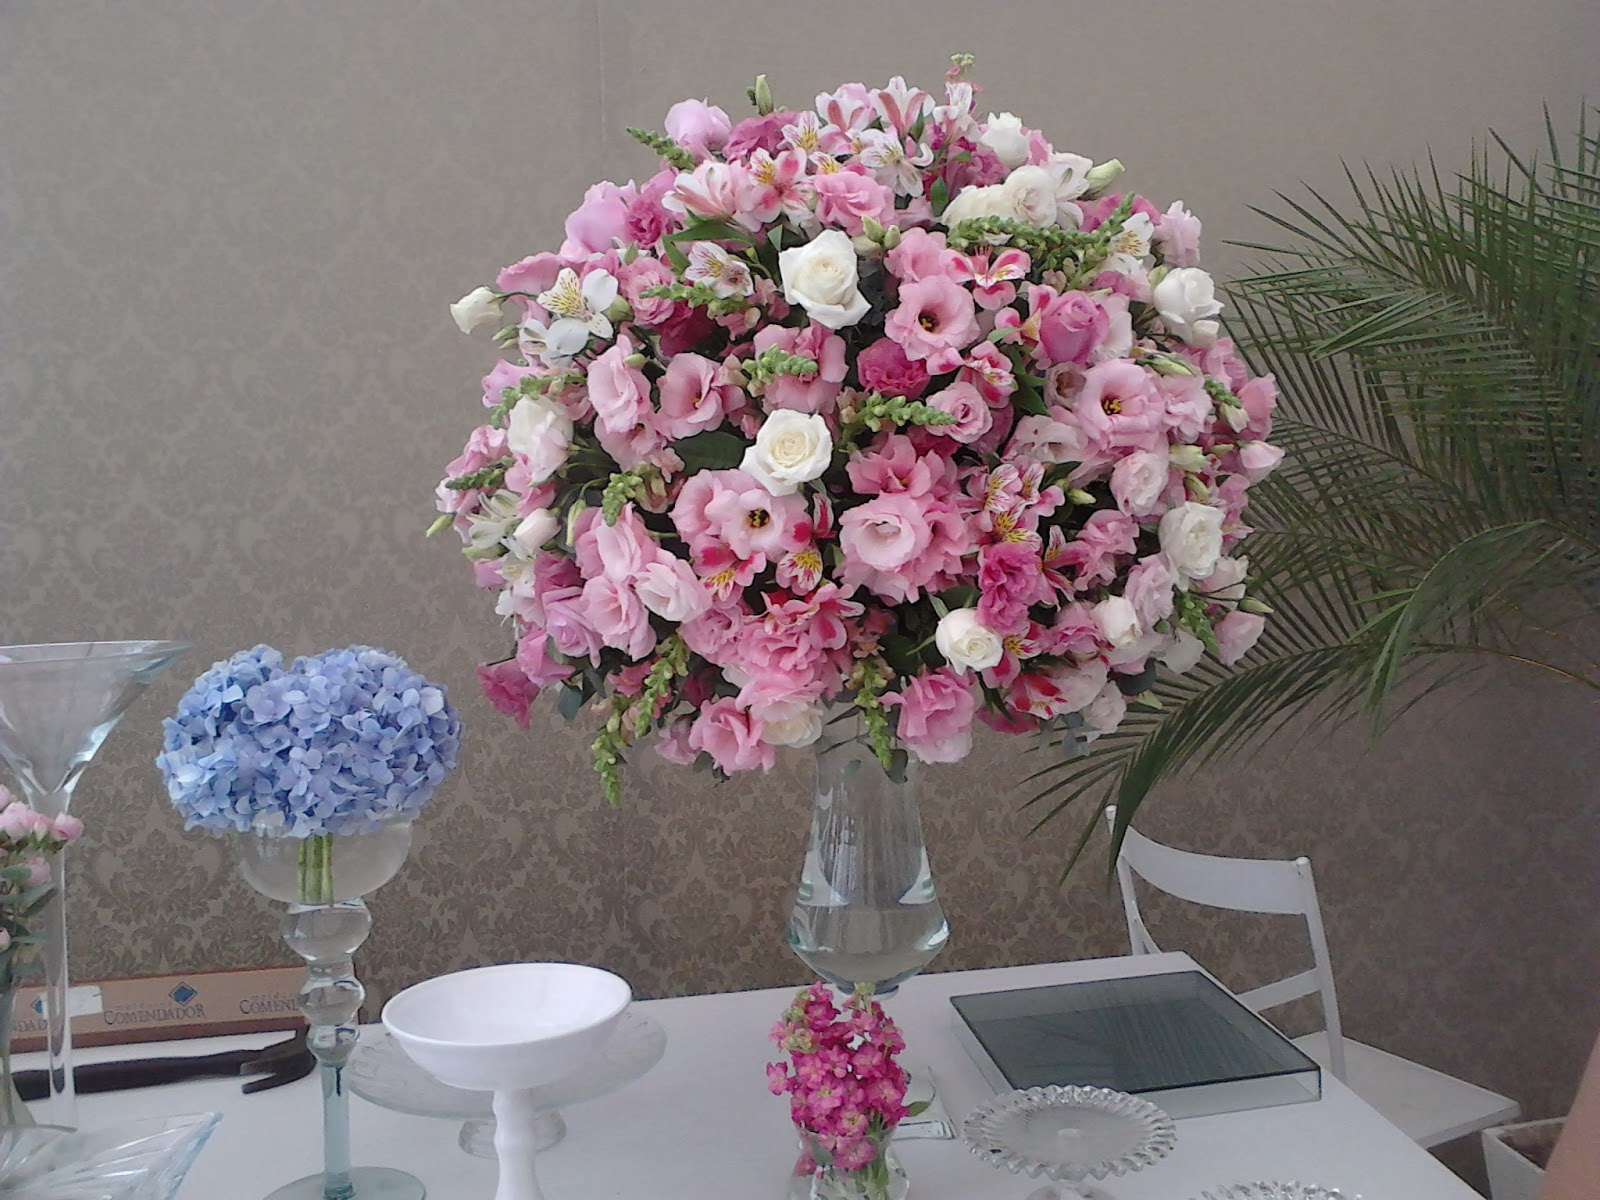 16 ideias de arranjos de mesa para casamento - Fotos De Arranjos De Flores Para Mesas